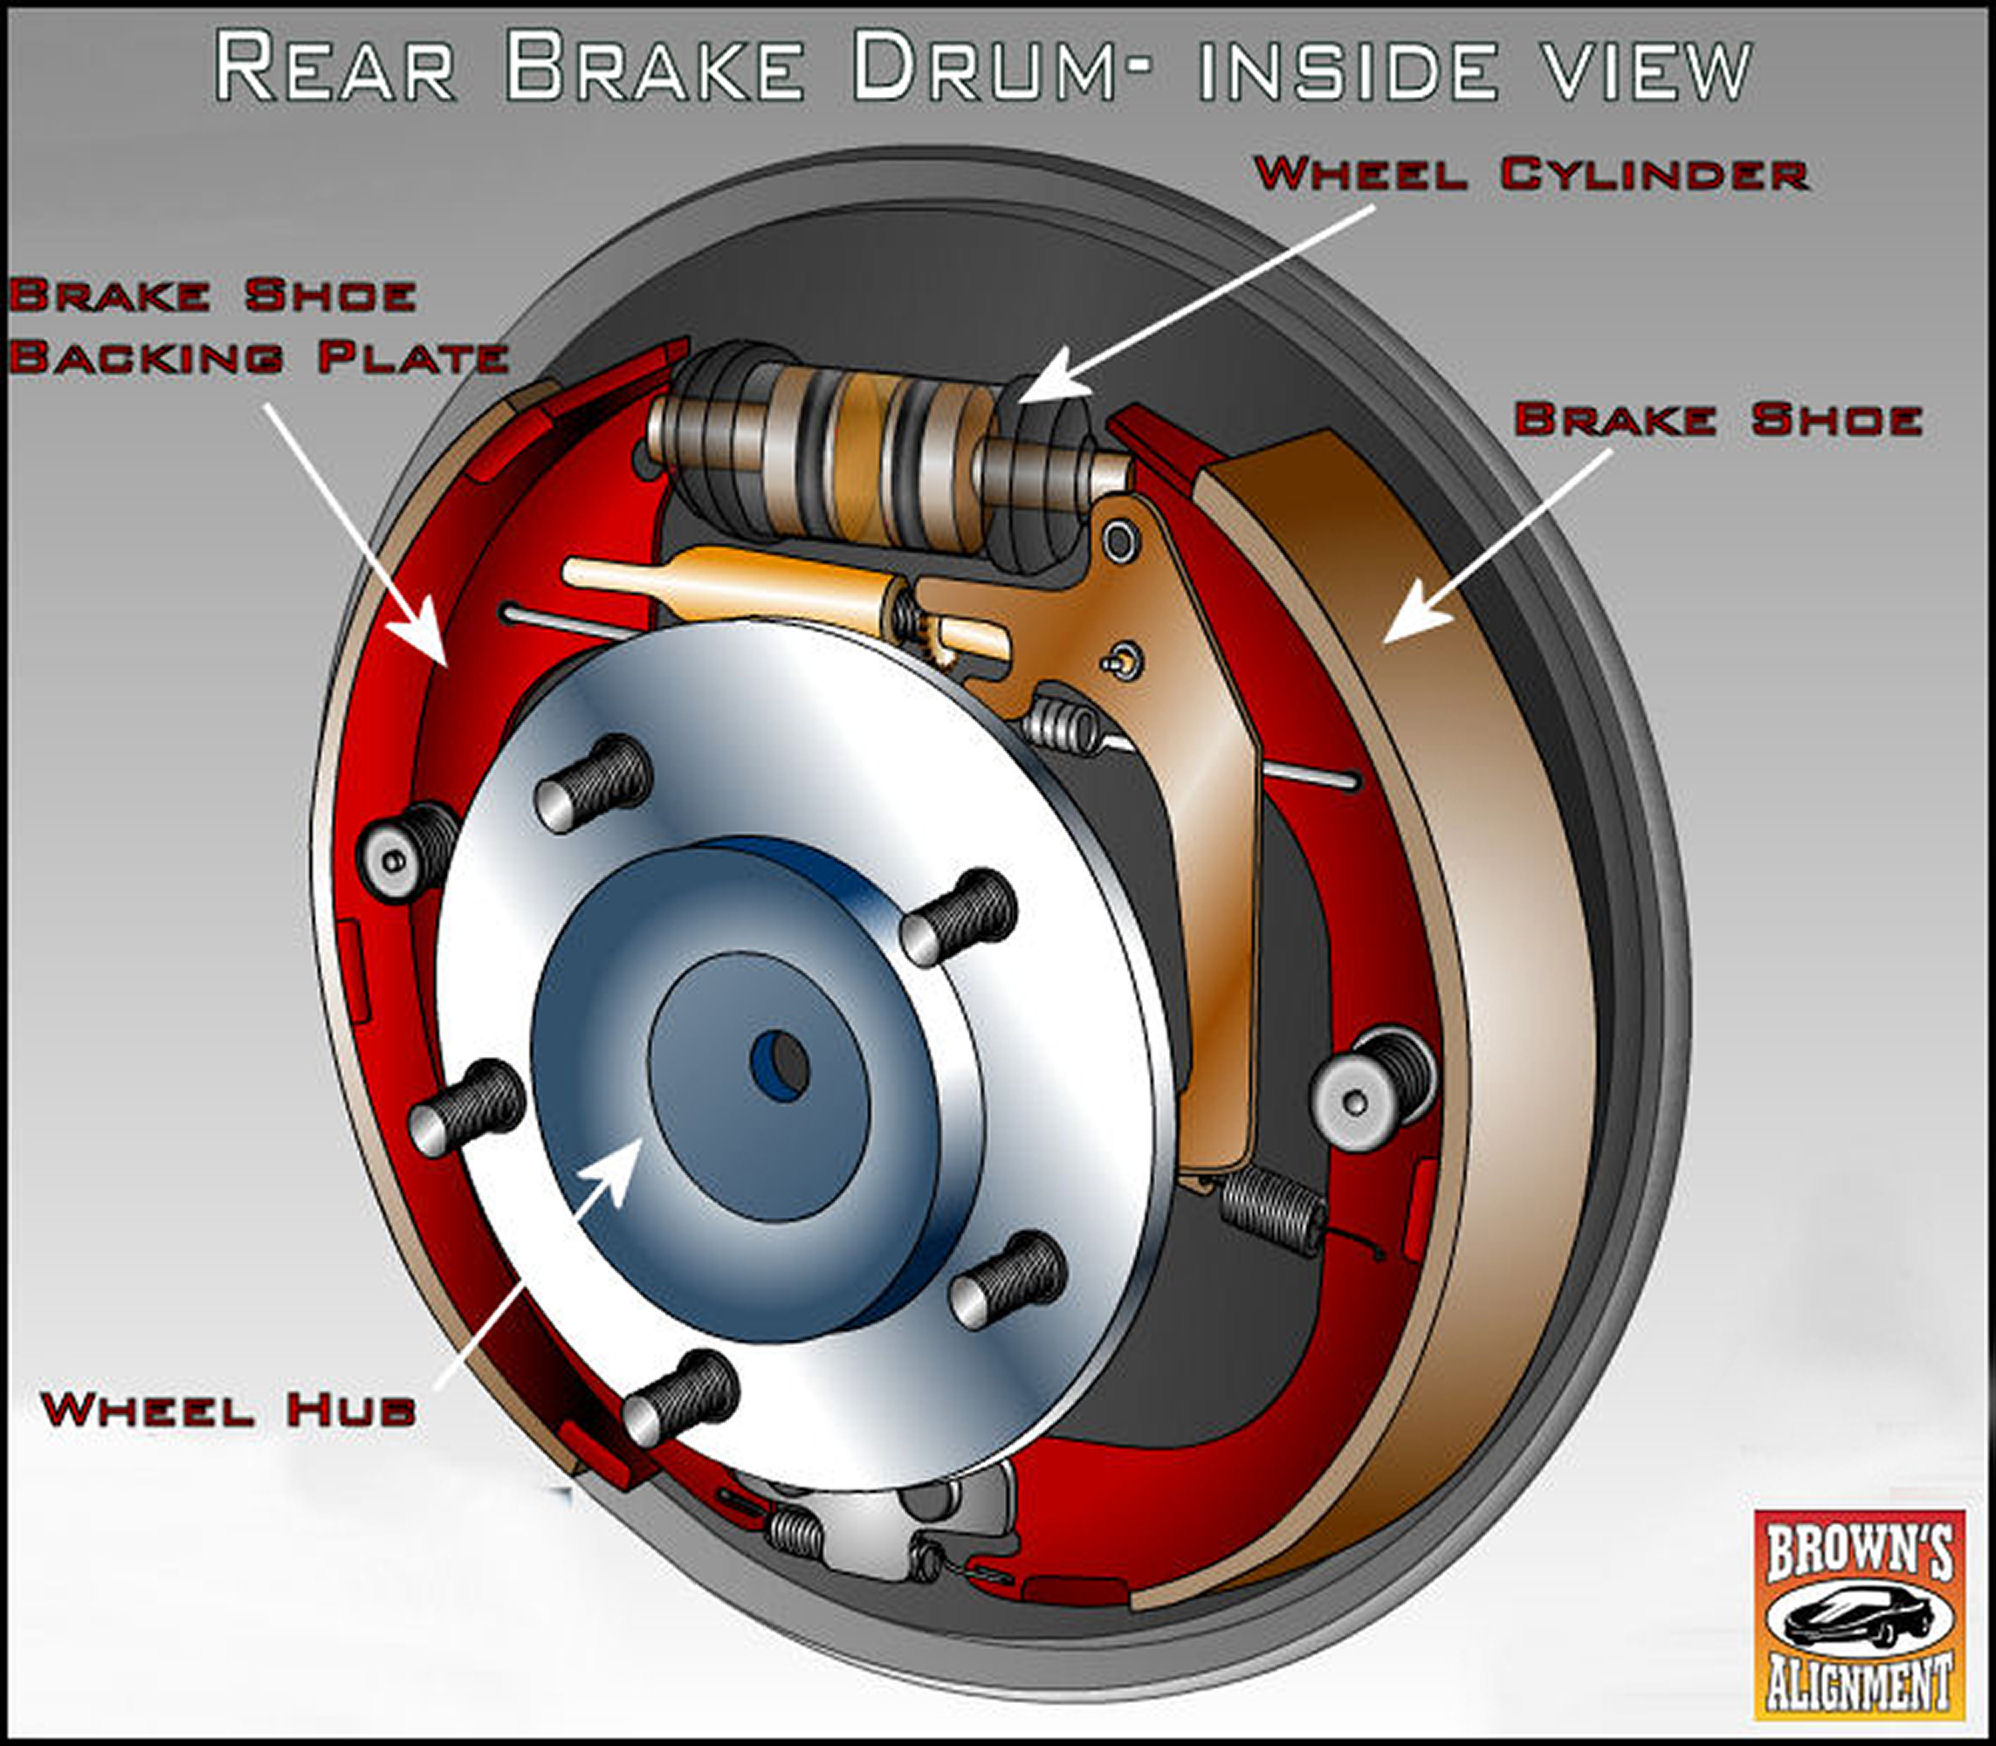 Watch in addition 366 Swieci Sie Kontrolka Silnik Check Engine Co To Oznacza besides Watch as well Watch as well Watch. on 2014 nissan pathfinder